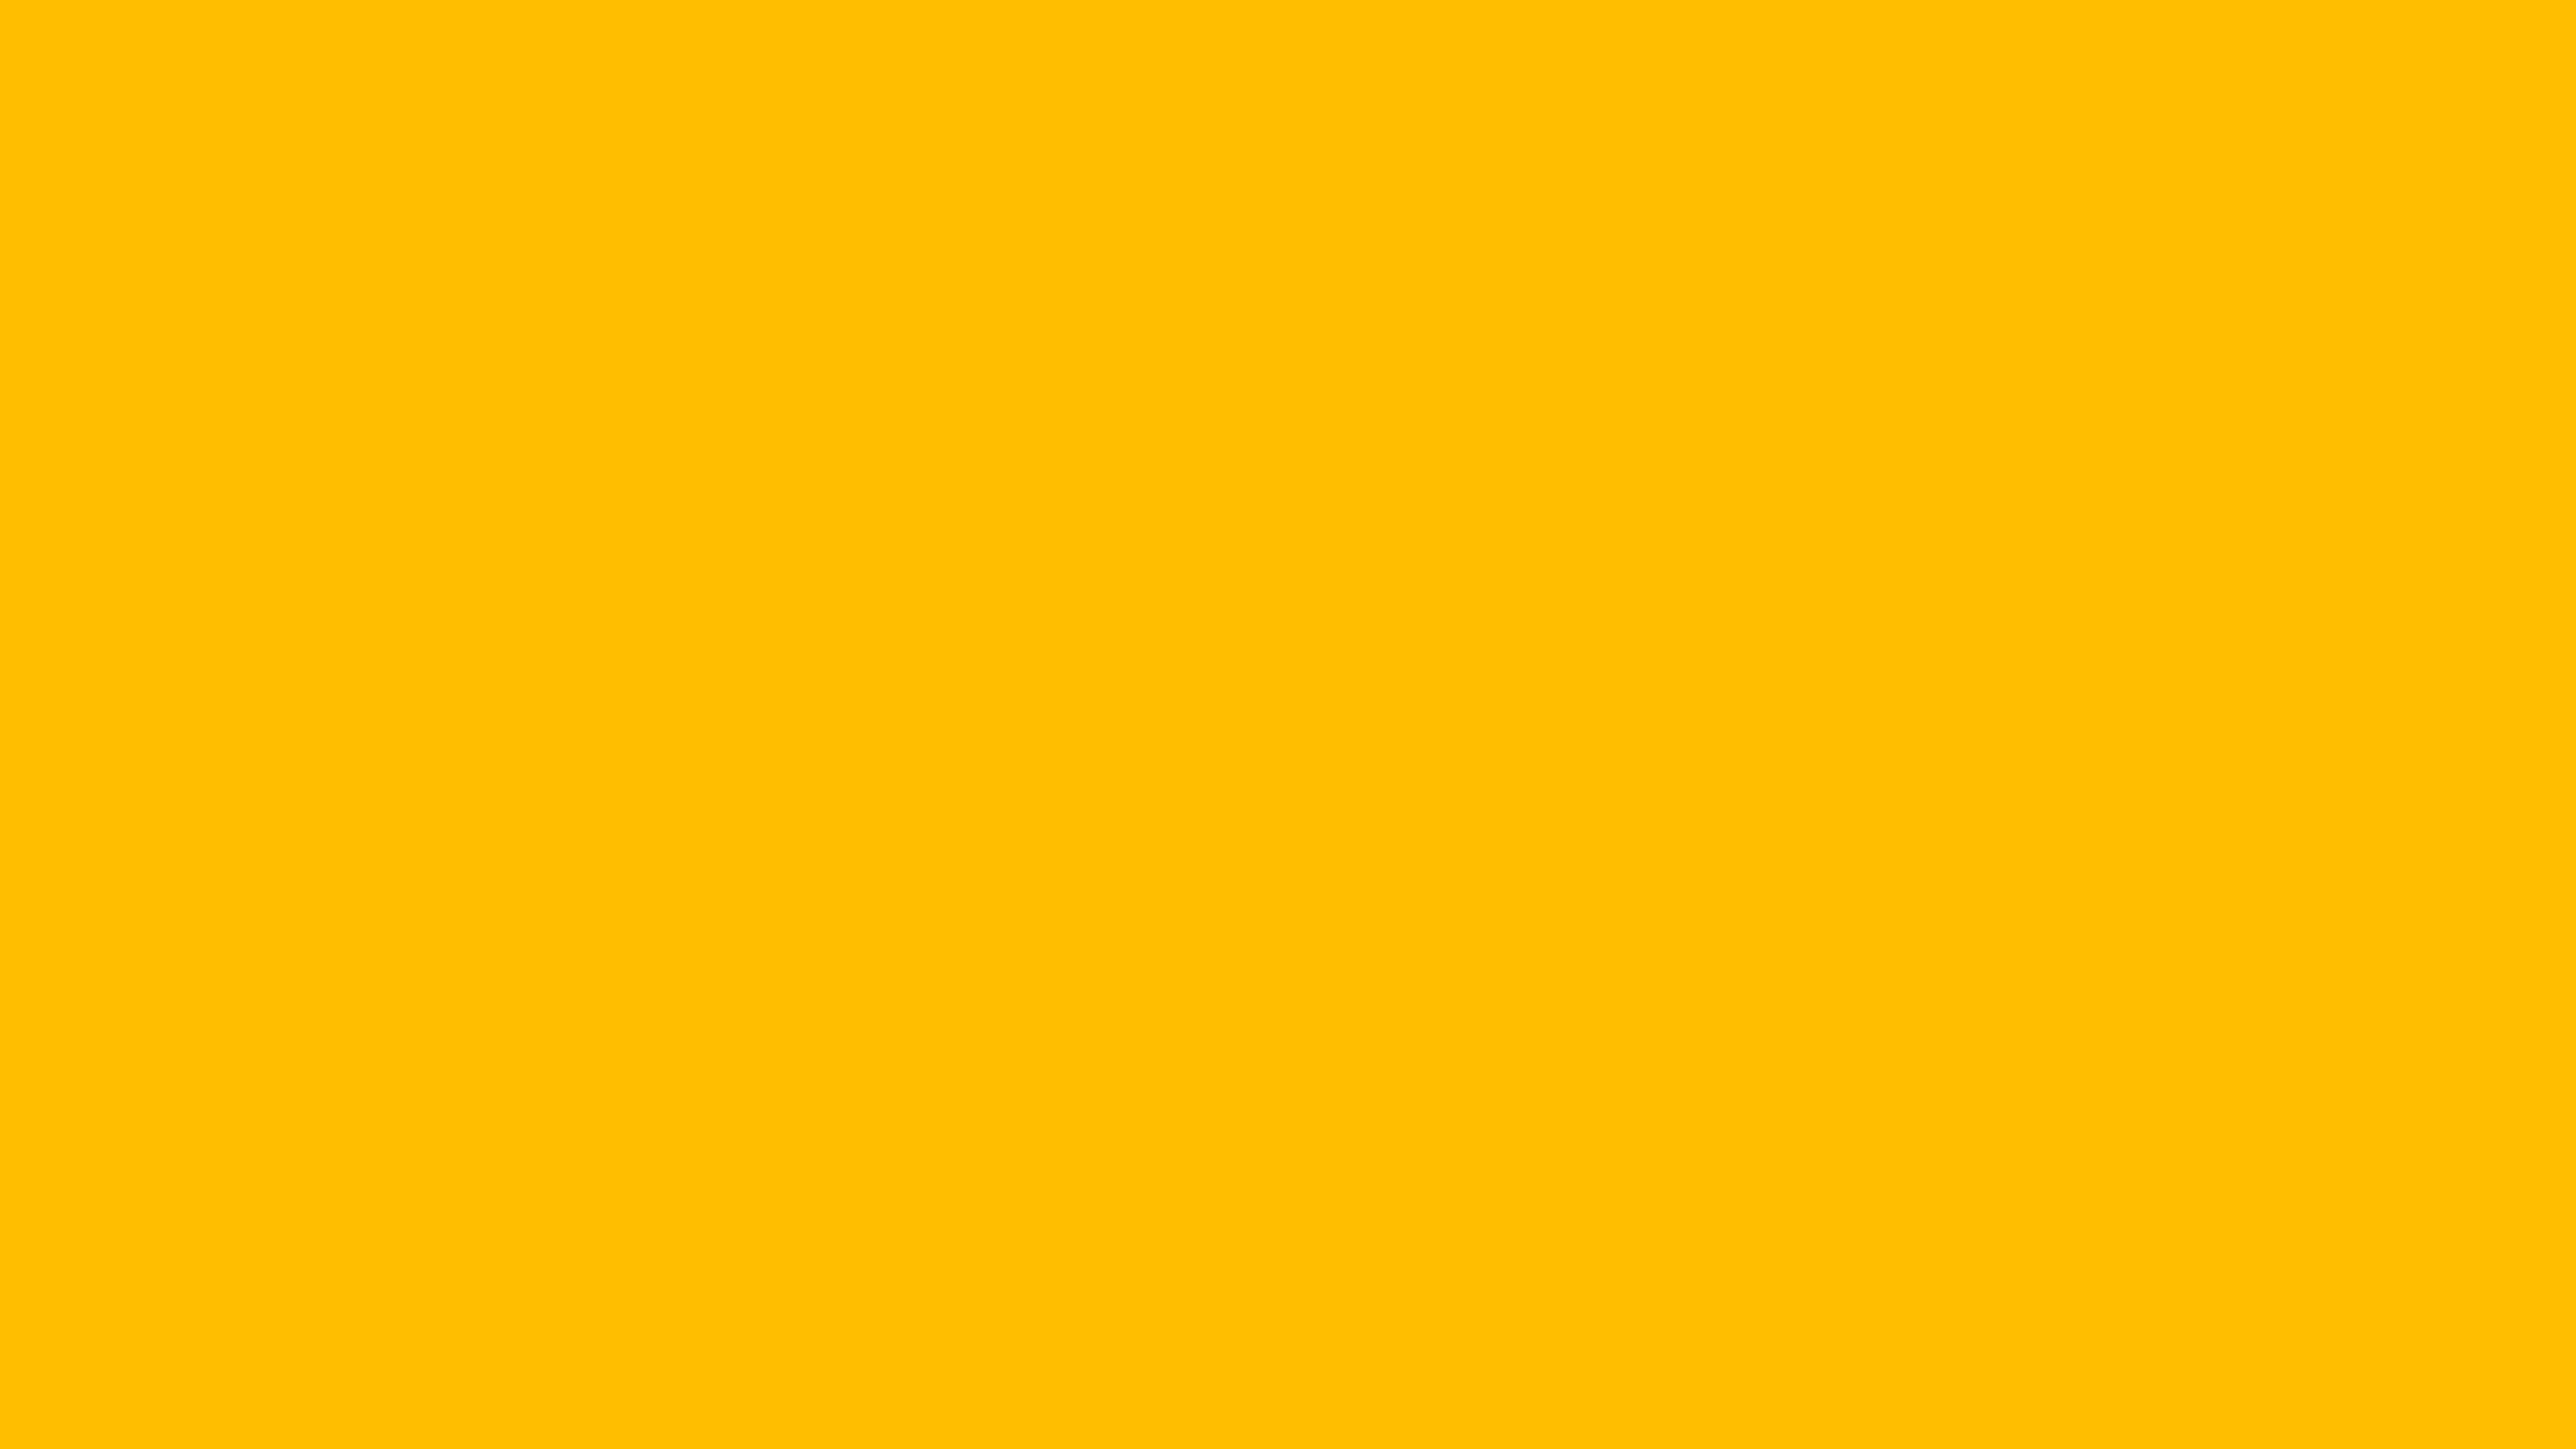 7680x4320 Fluorescent Orange Solid Color Background